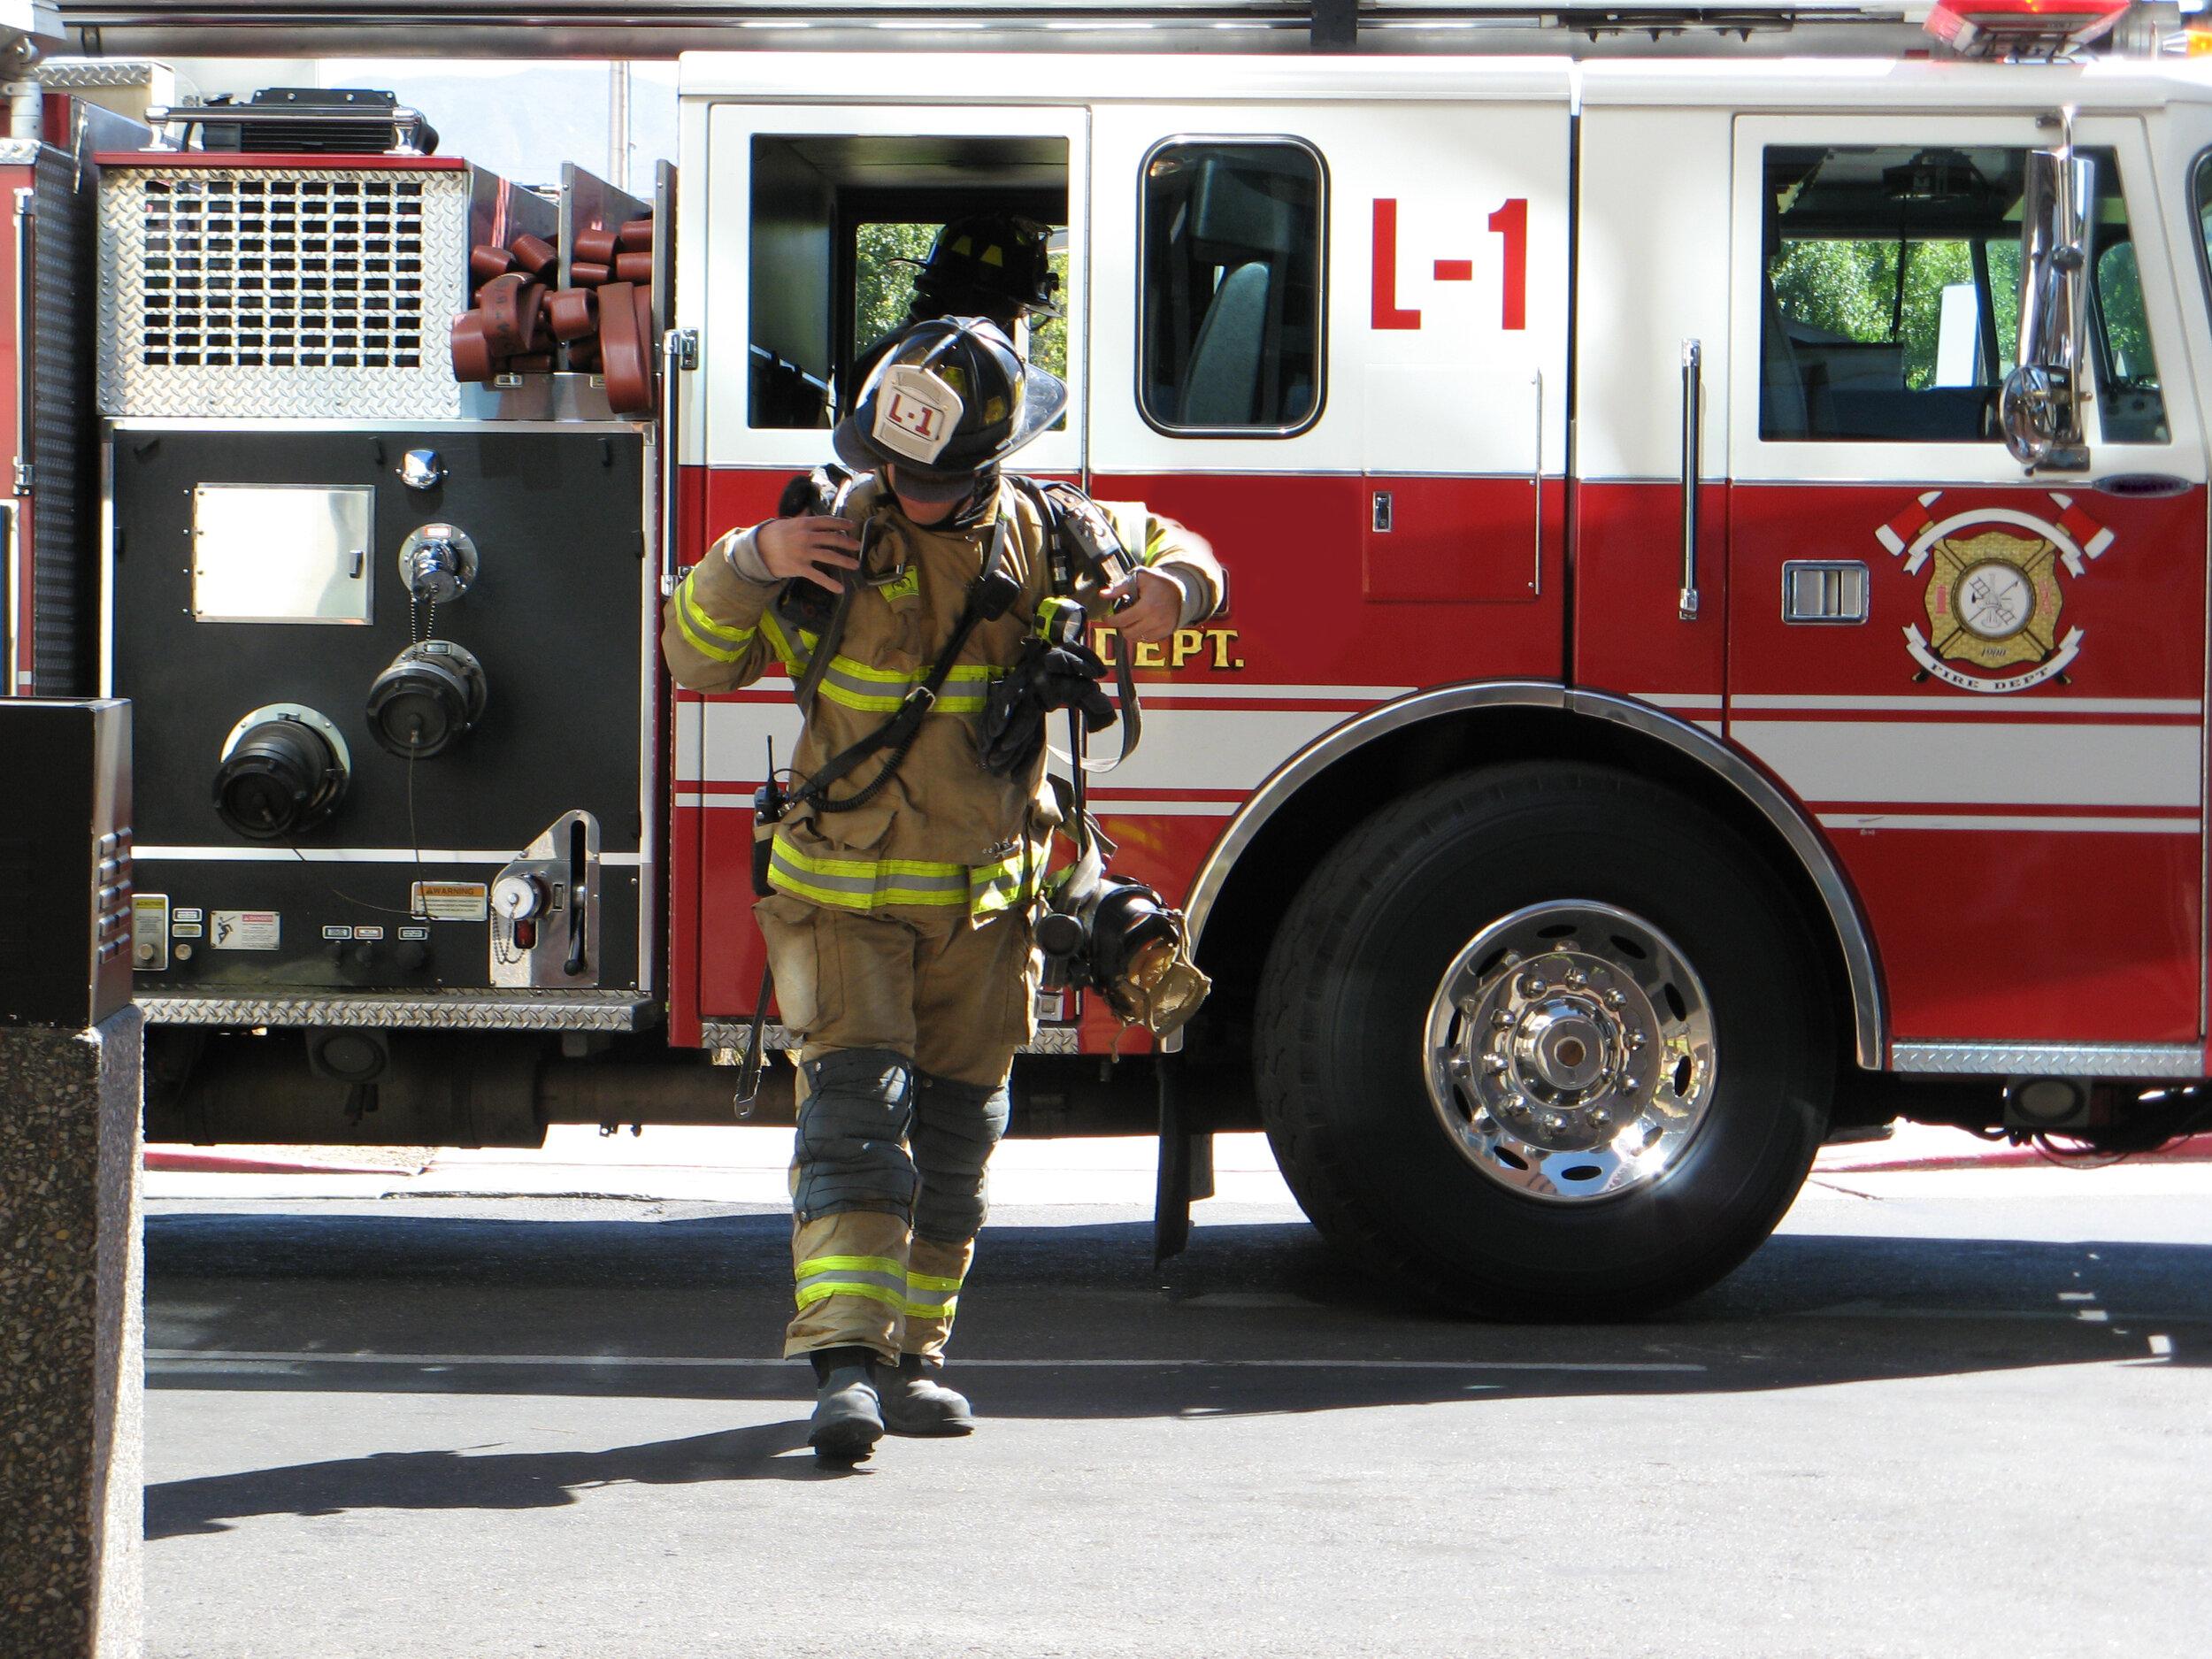 bigstock-Fireman-Rushing-To-Respond-To--7364694.jpg